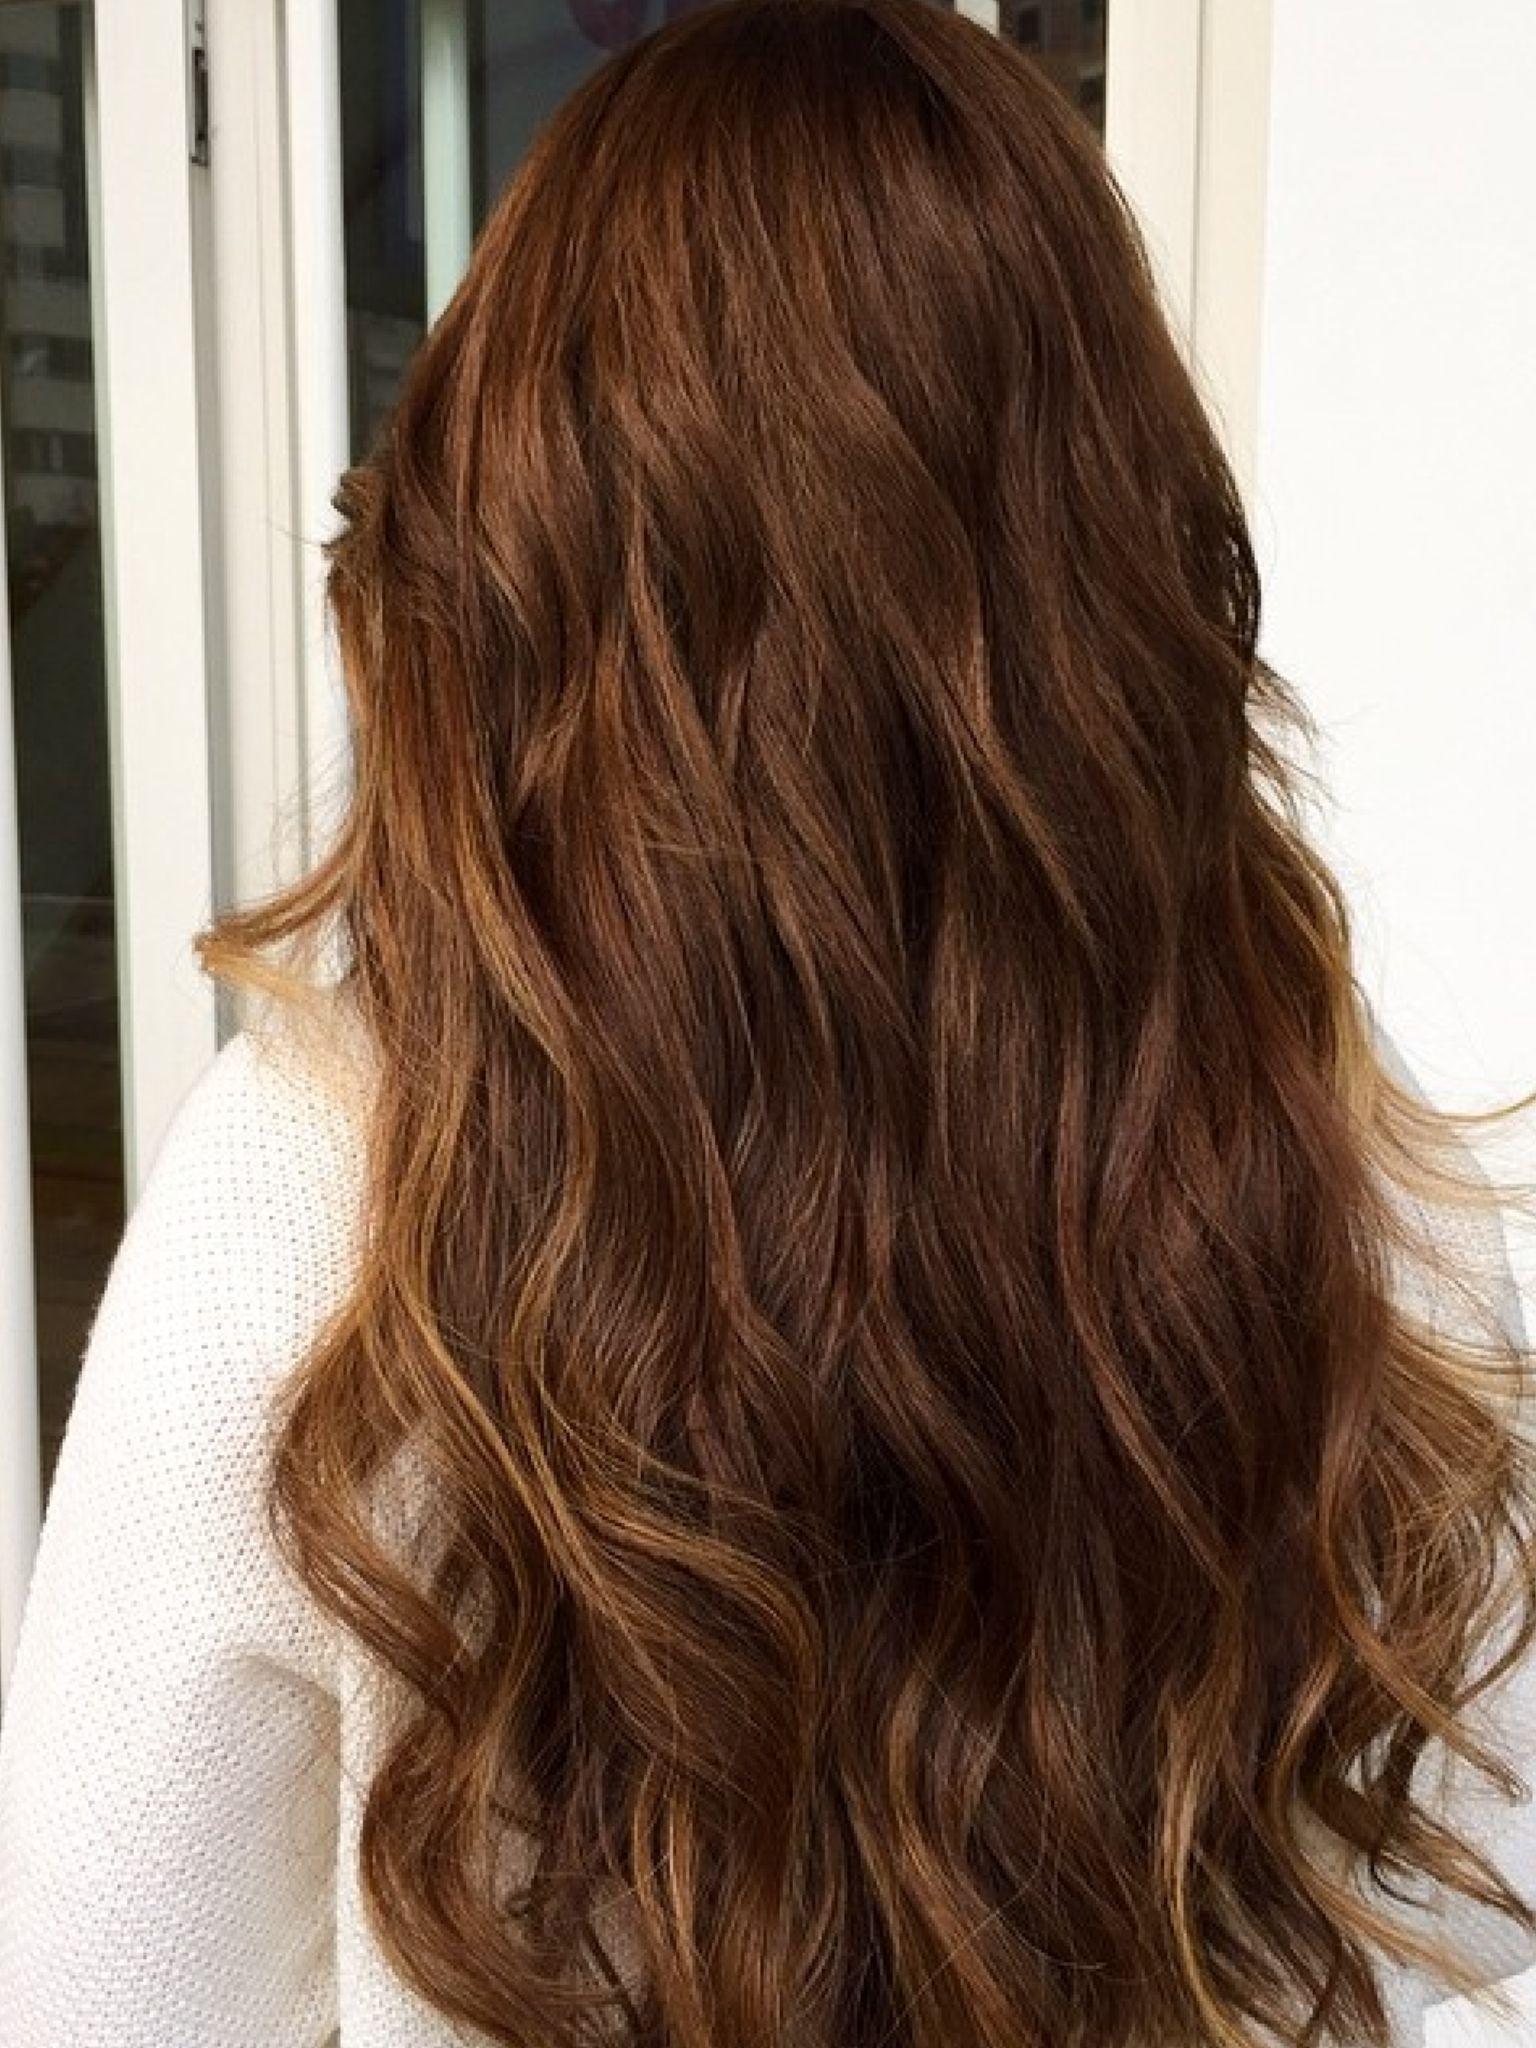 Isiltili Ceylan Kahvesi Hair Long Hair Styles Beautiful Hair